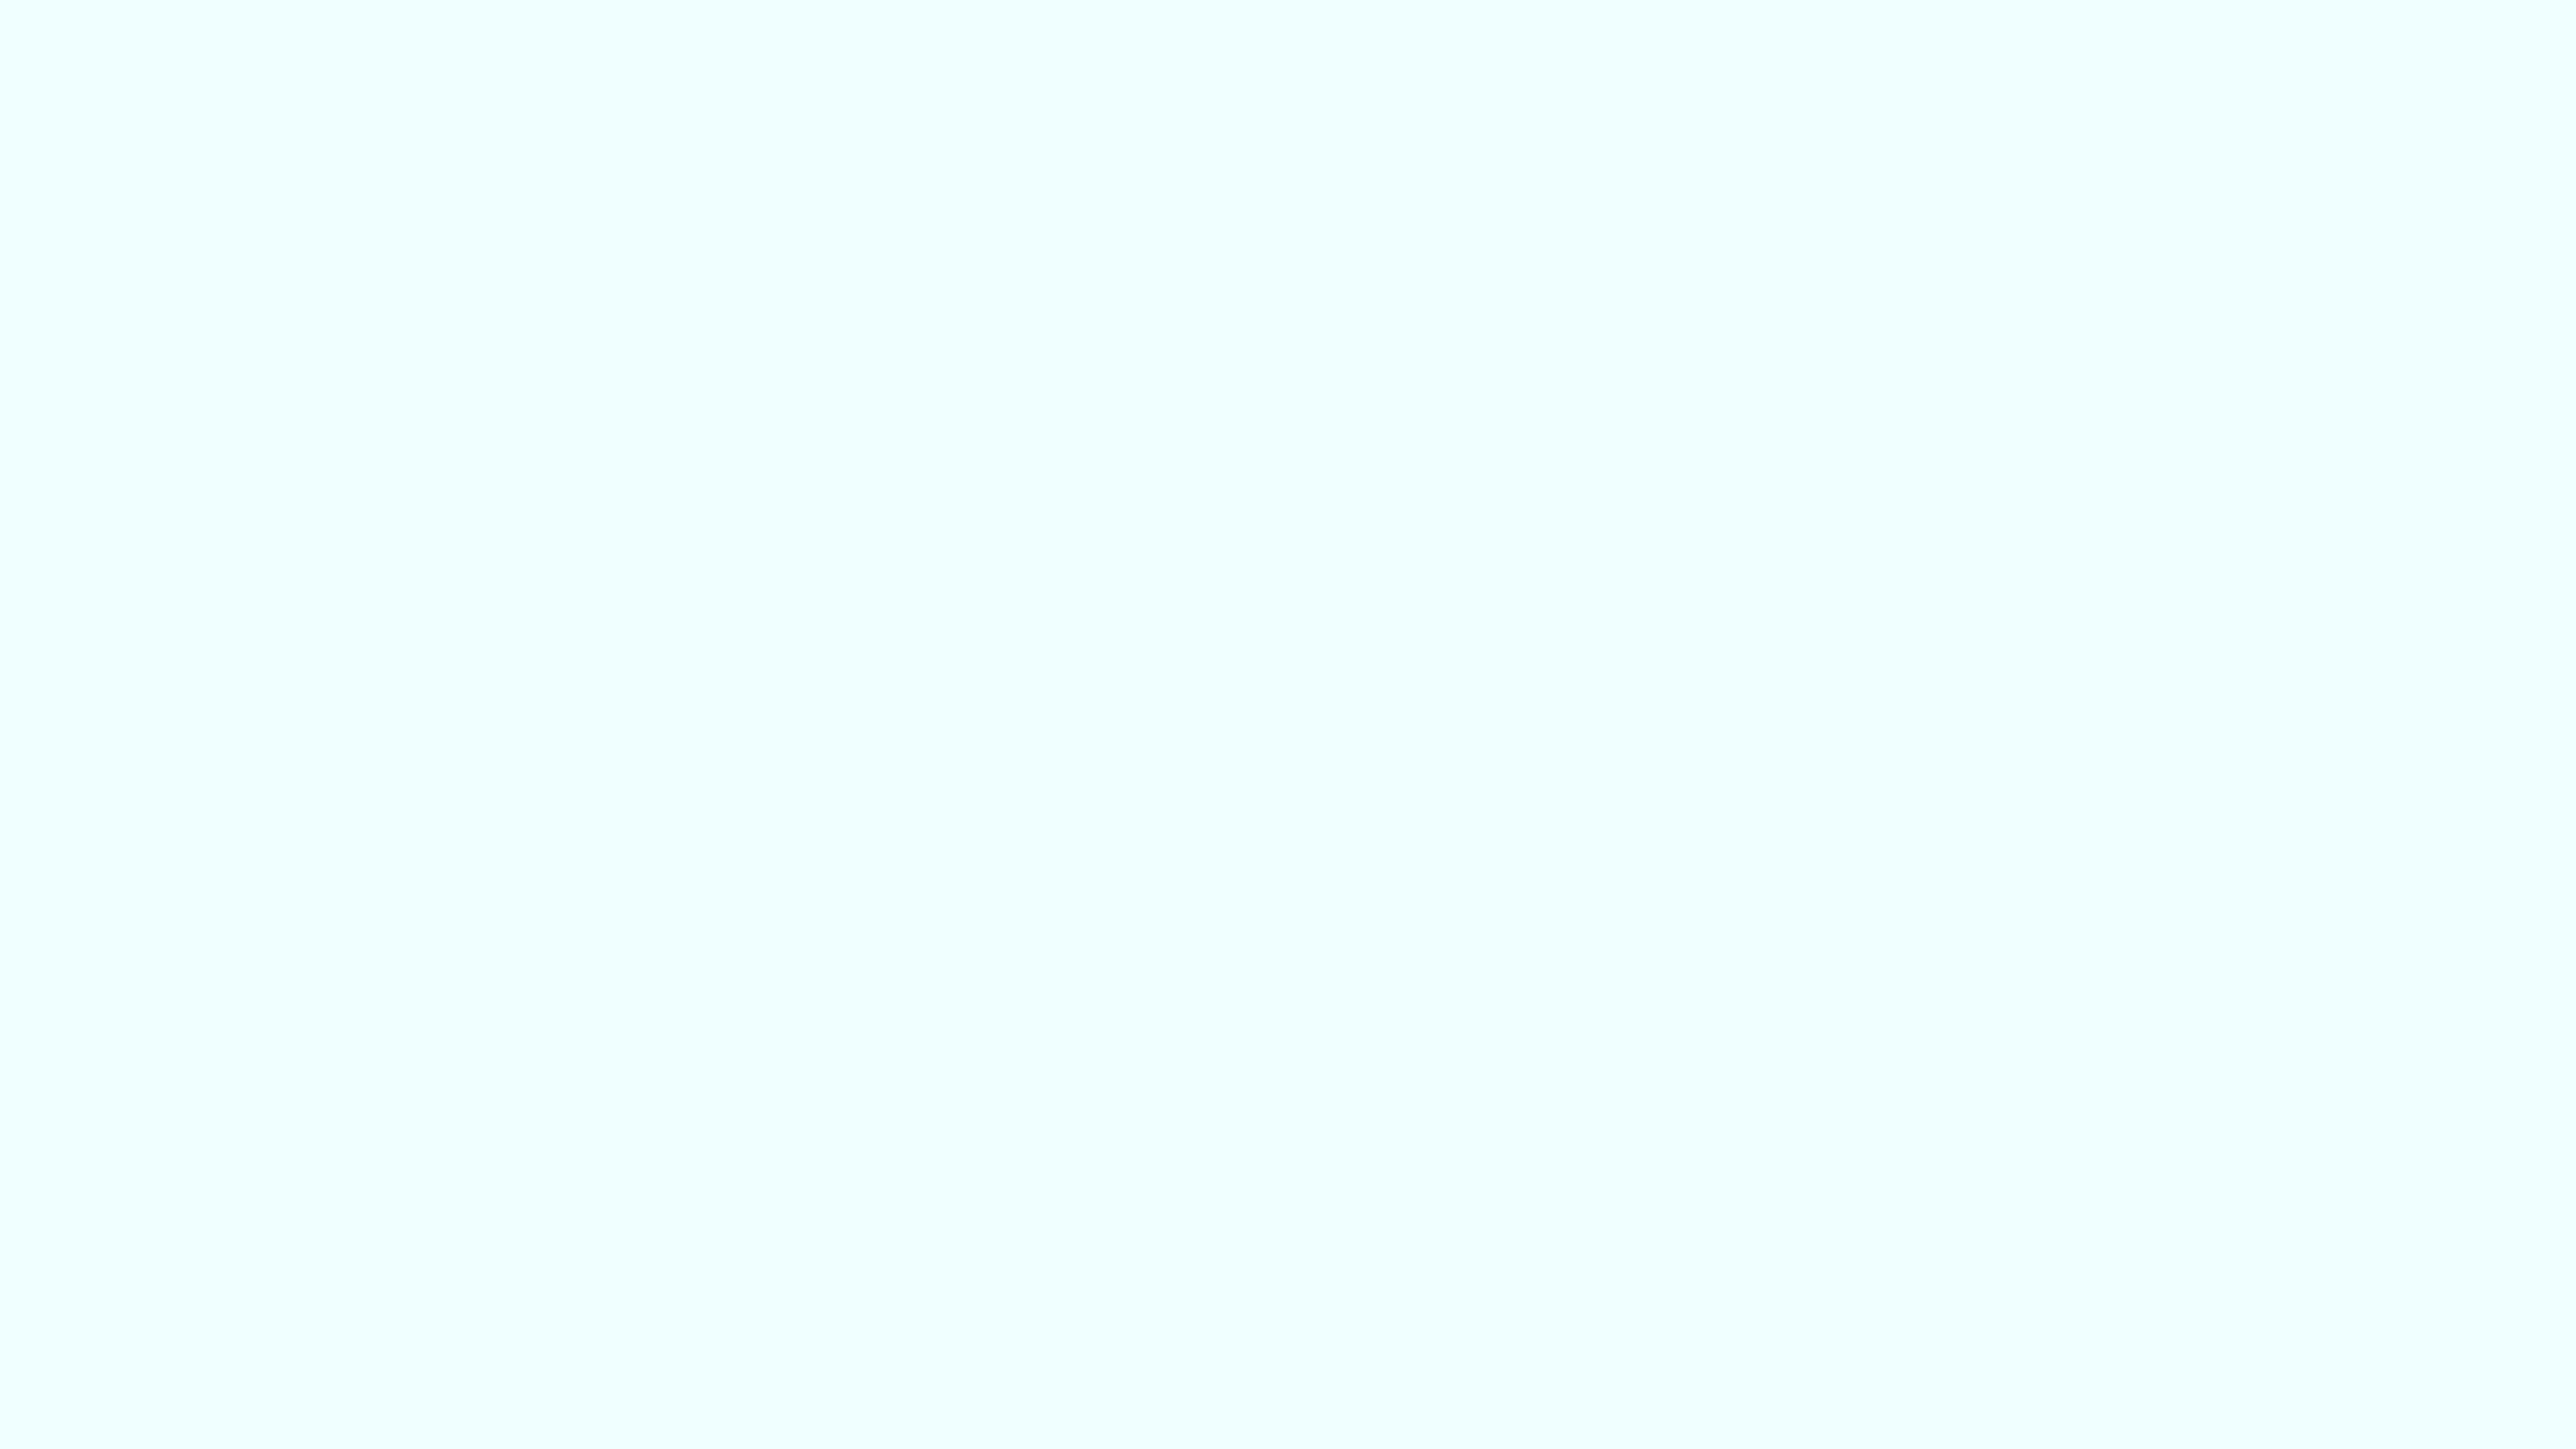 7680x4320 Azure Mist Solid Color Background